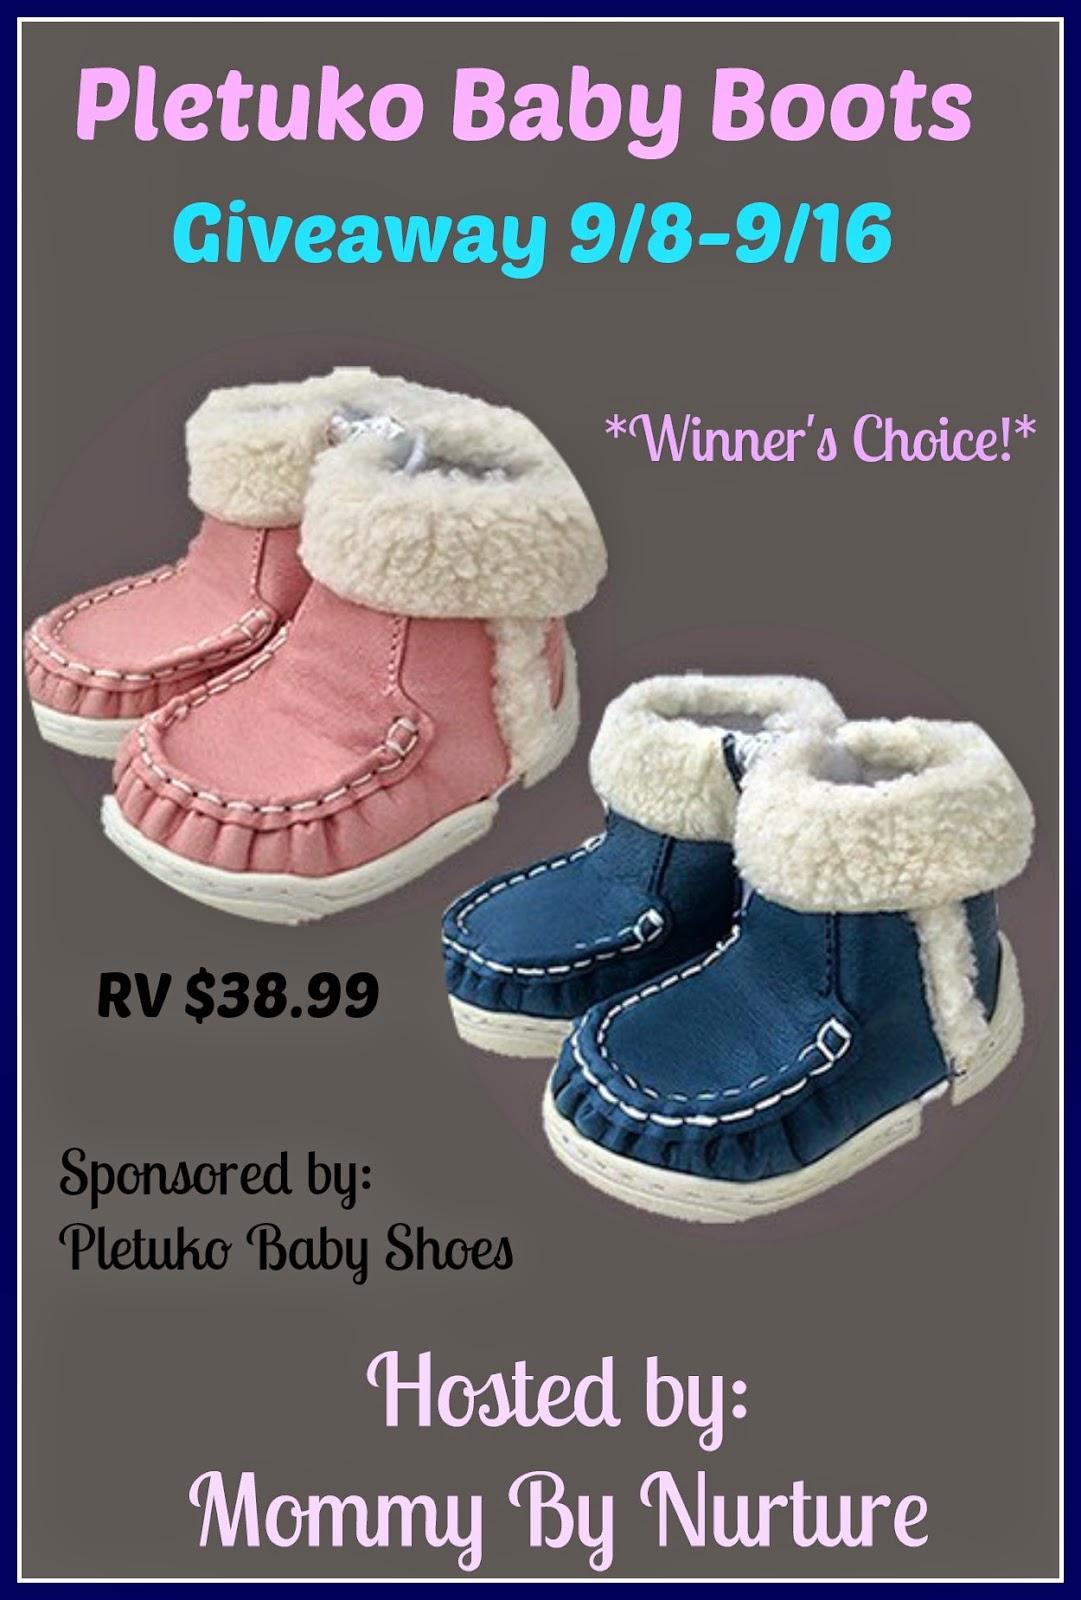 Pletuko Baby Boots Giveaway